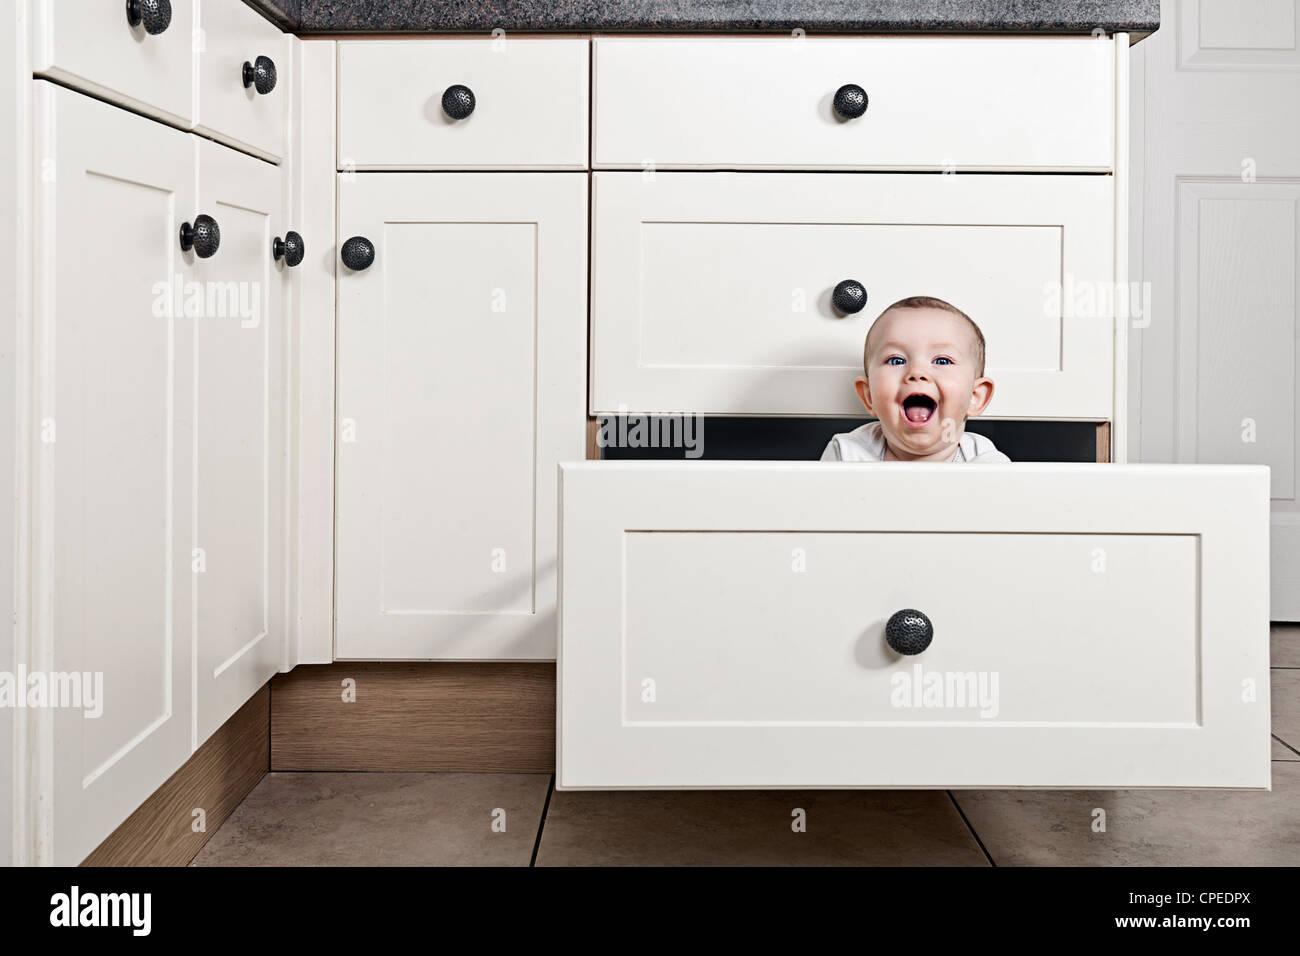 Smiling Baby Girl à tiroir de cuisine Photo Stock